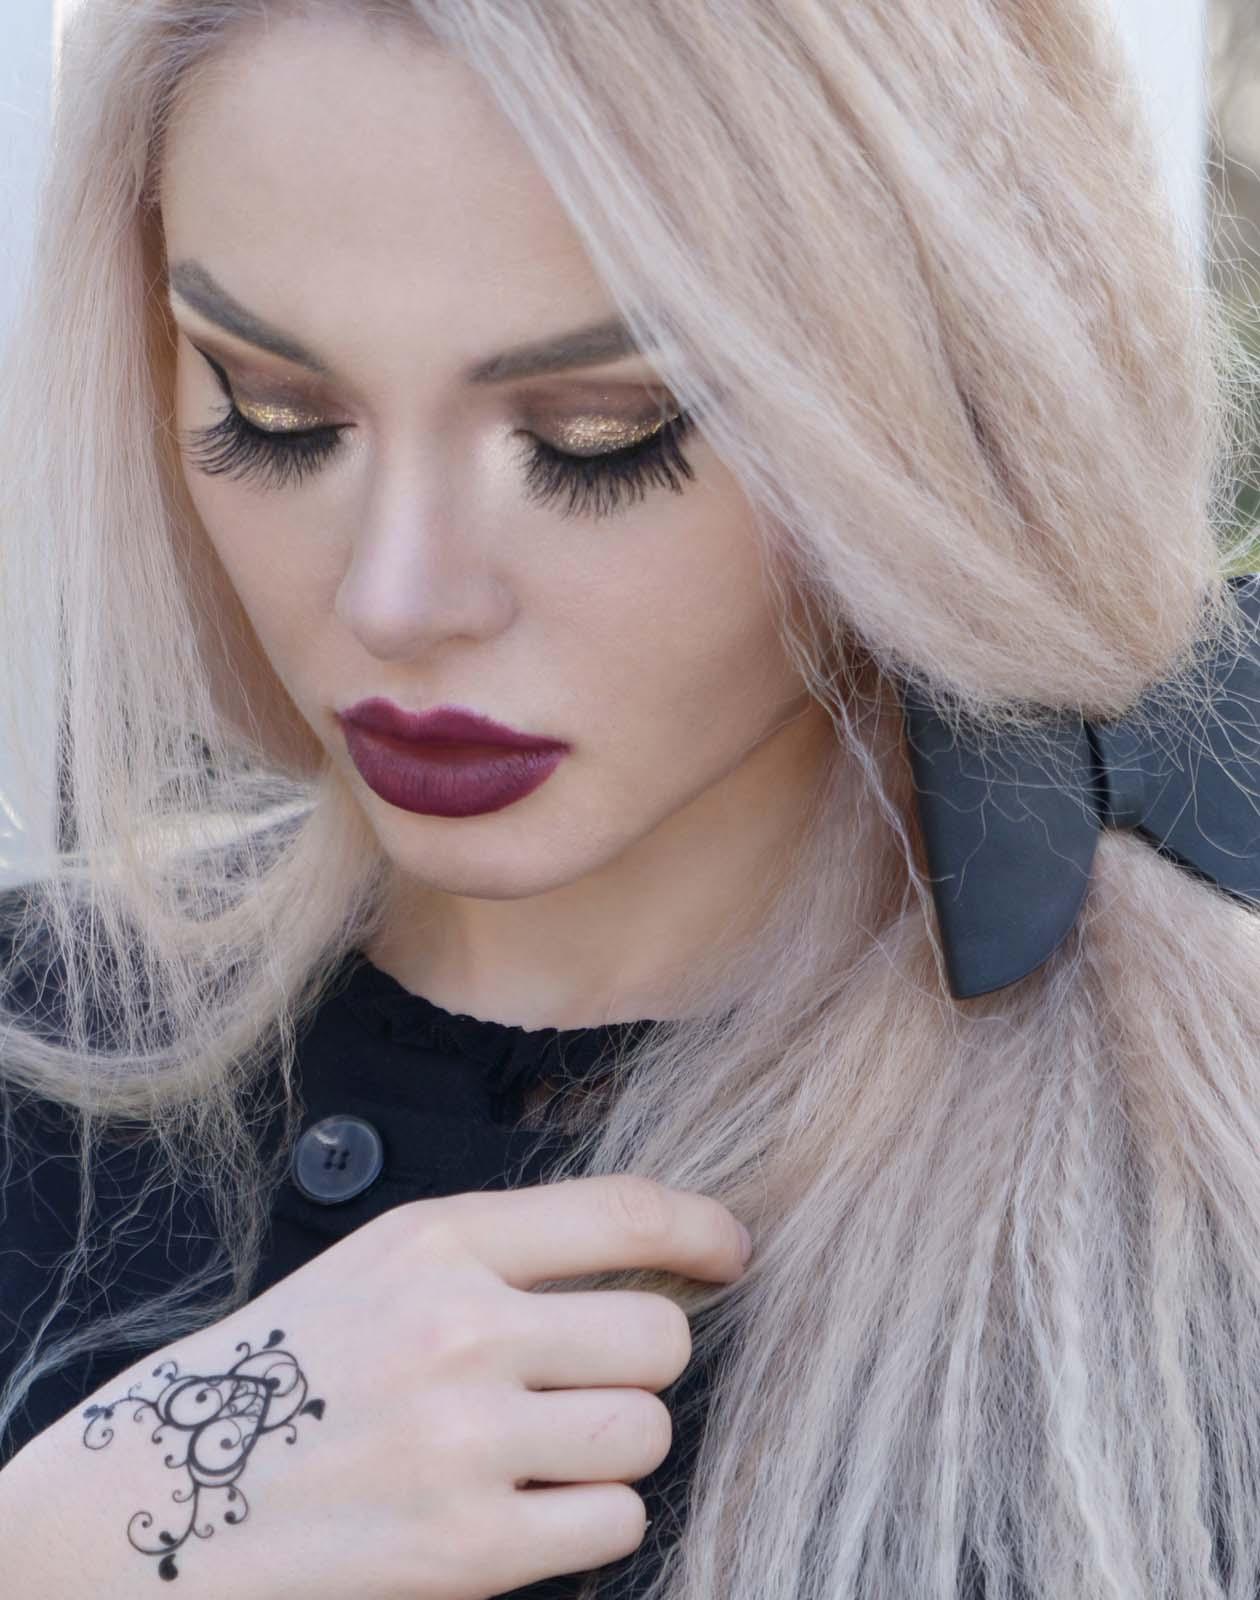 07_black_lace_burgundy_lips_golden_eyes